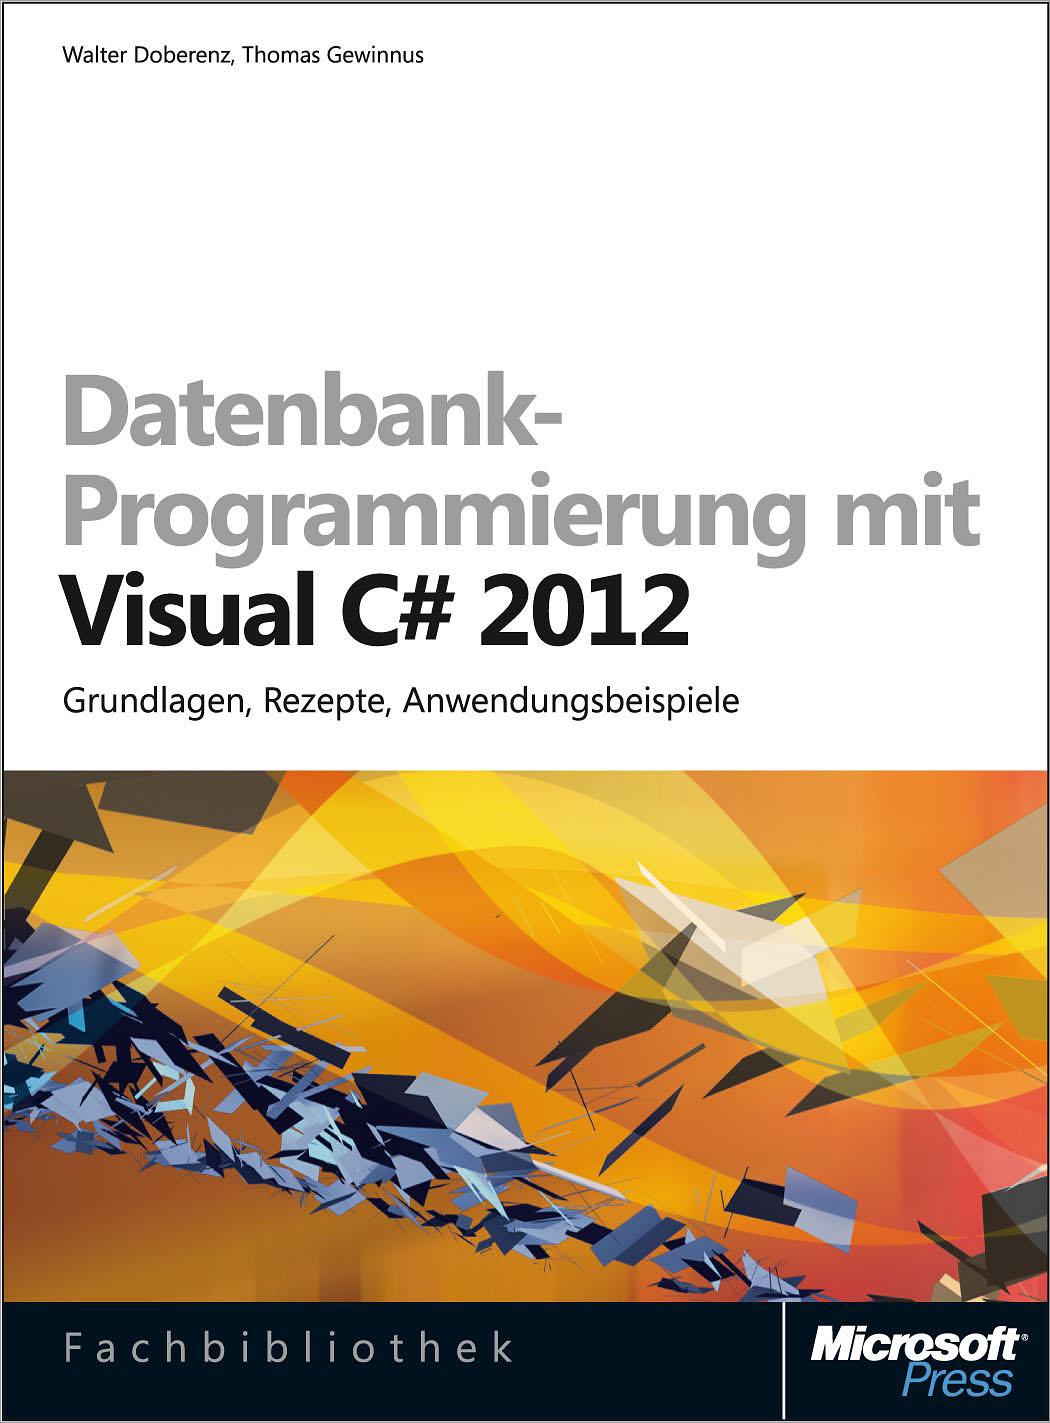 Walter Doberenz Datenbank-Programmierung mit Visual C# 2012 пахомов борис исаакович c c и ms visual c 2012 для начинающих